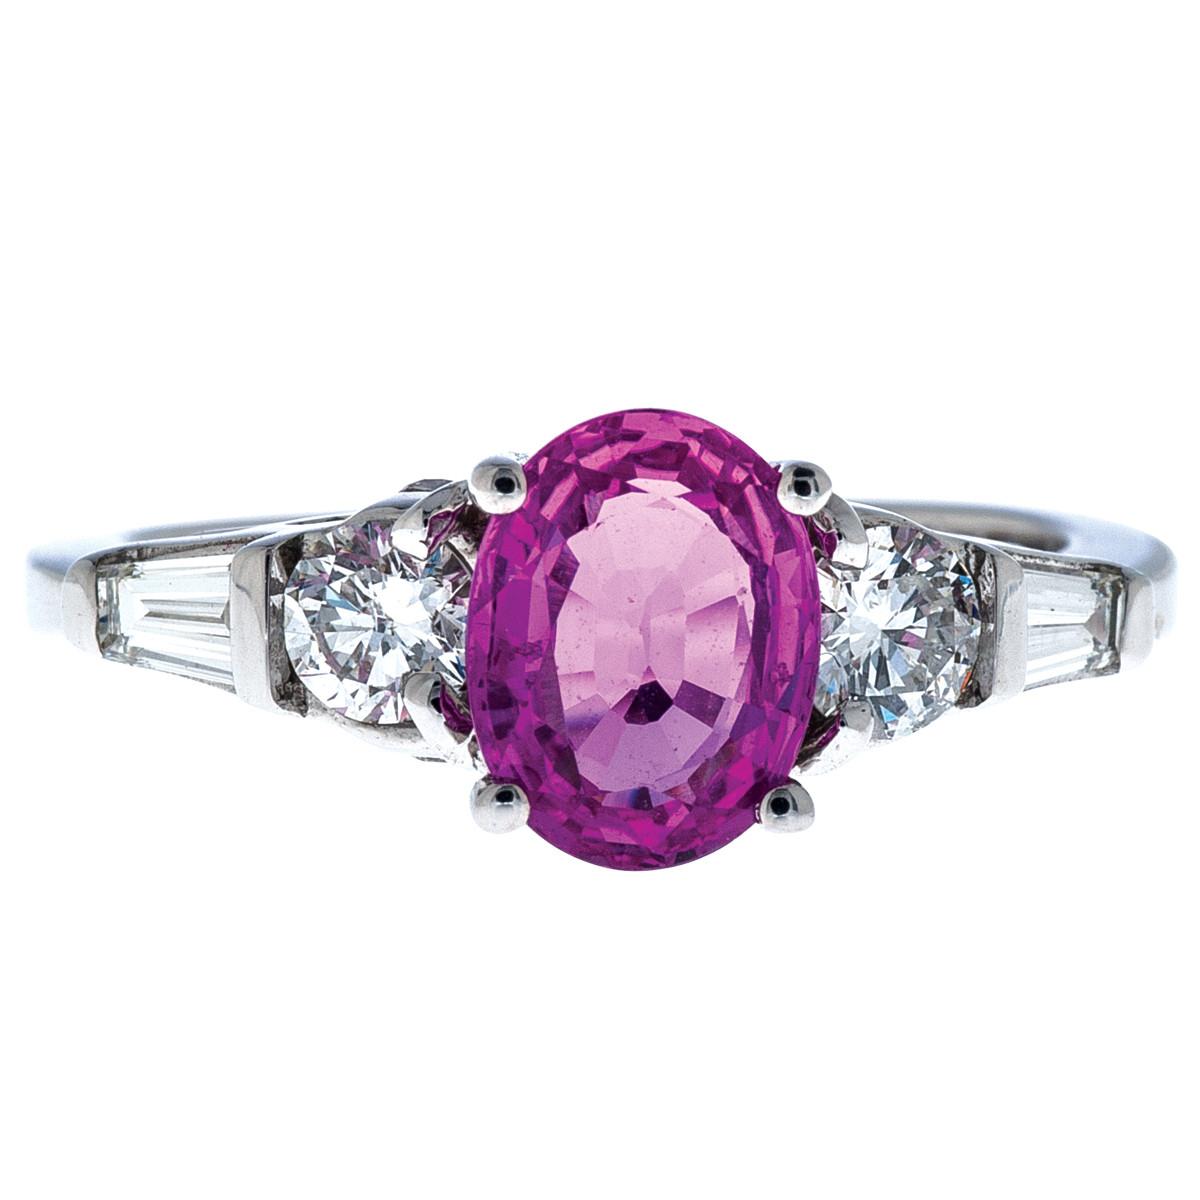 Vintage Le Vian 1.01 CT Sapphire & Diamond Ring